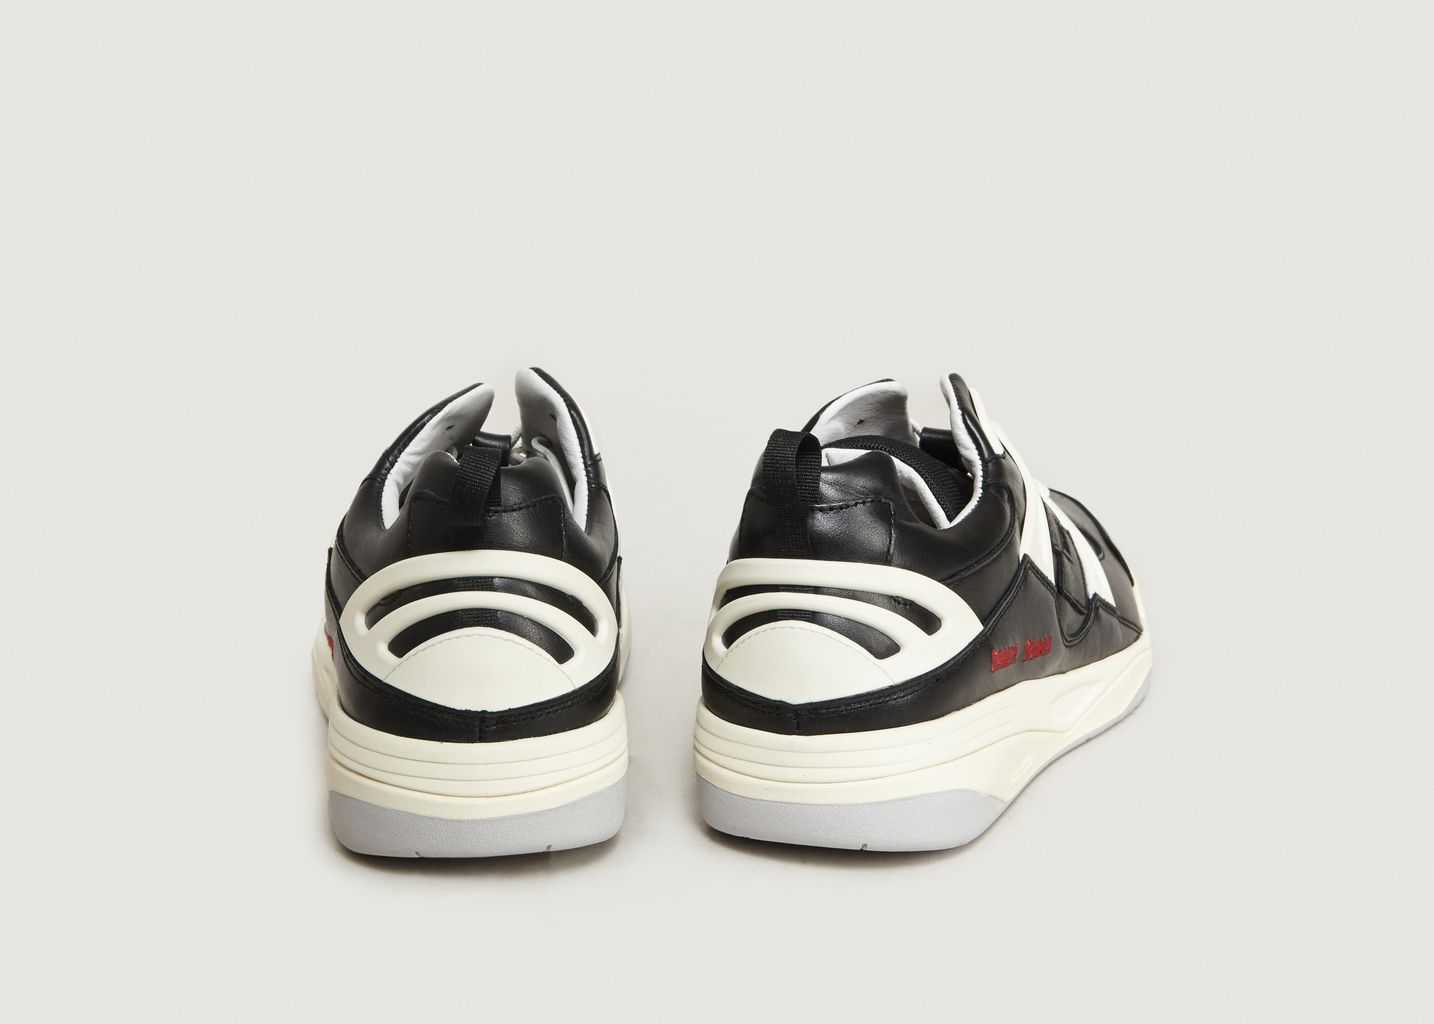 Sneakers Lotto - Damir Doma x Lotto